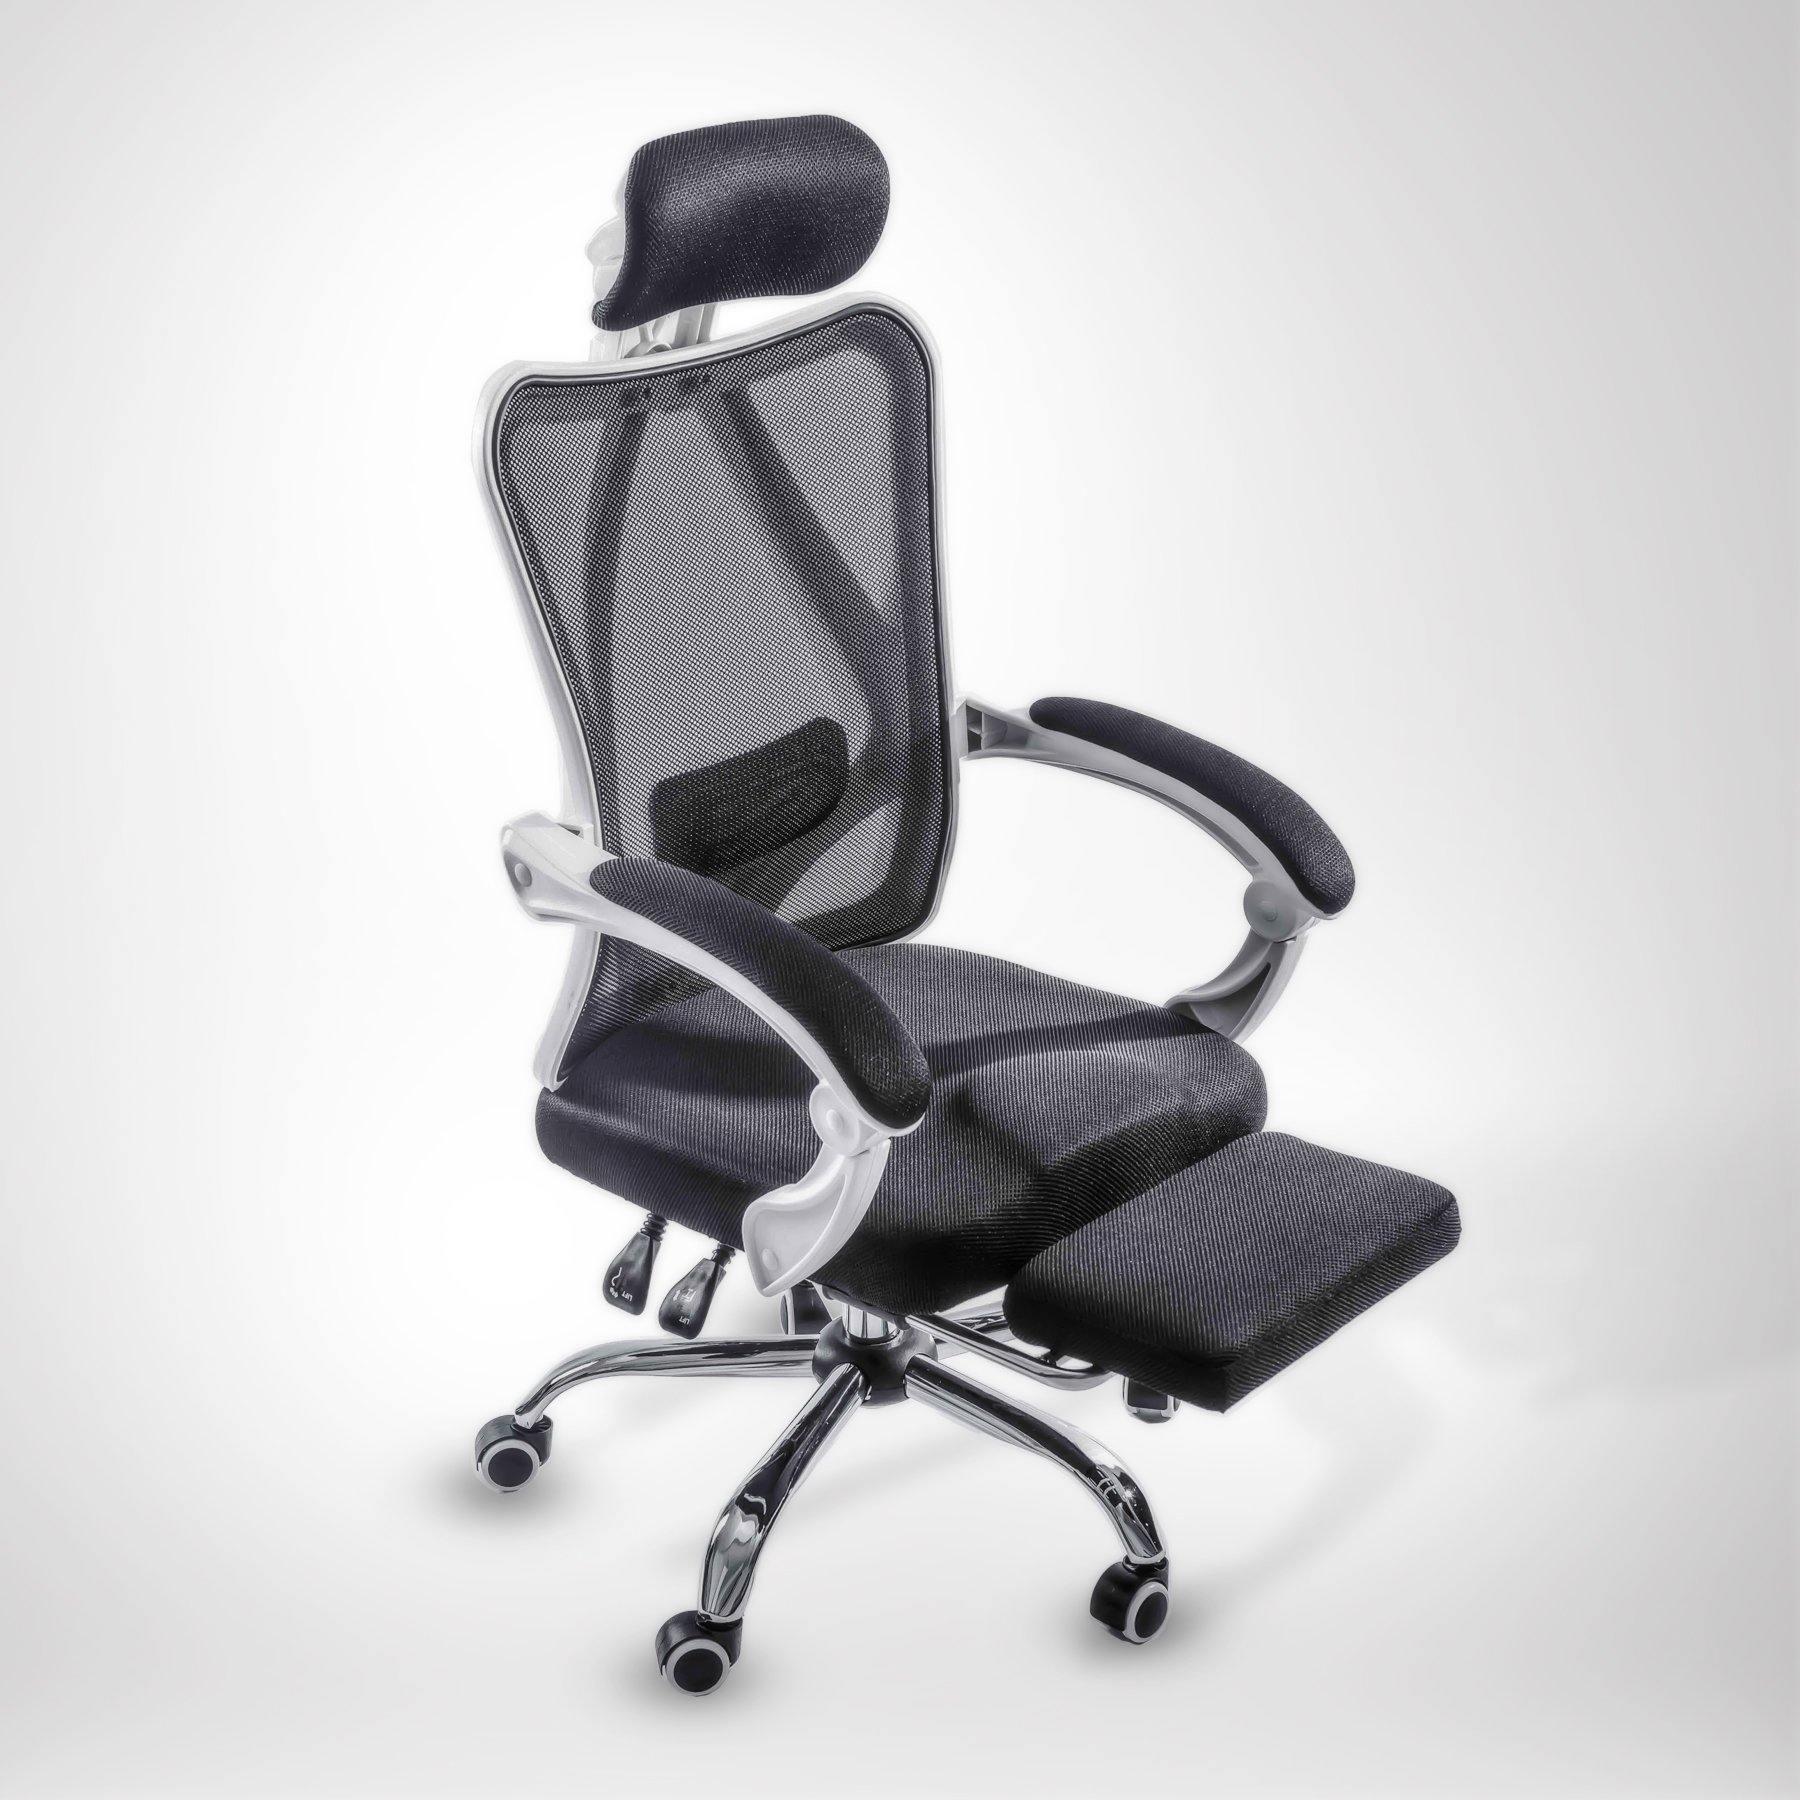 【Future】6D人體工學電腦躺椅-舒適辦公電腦椅 - FutureLab.